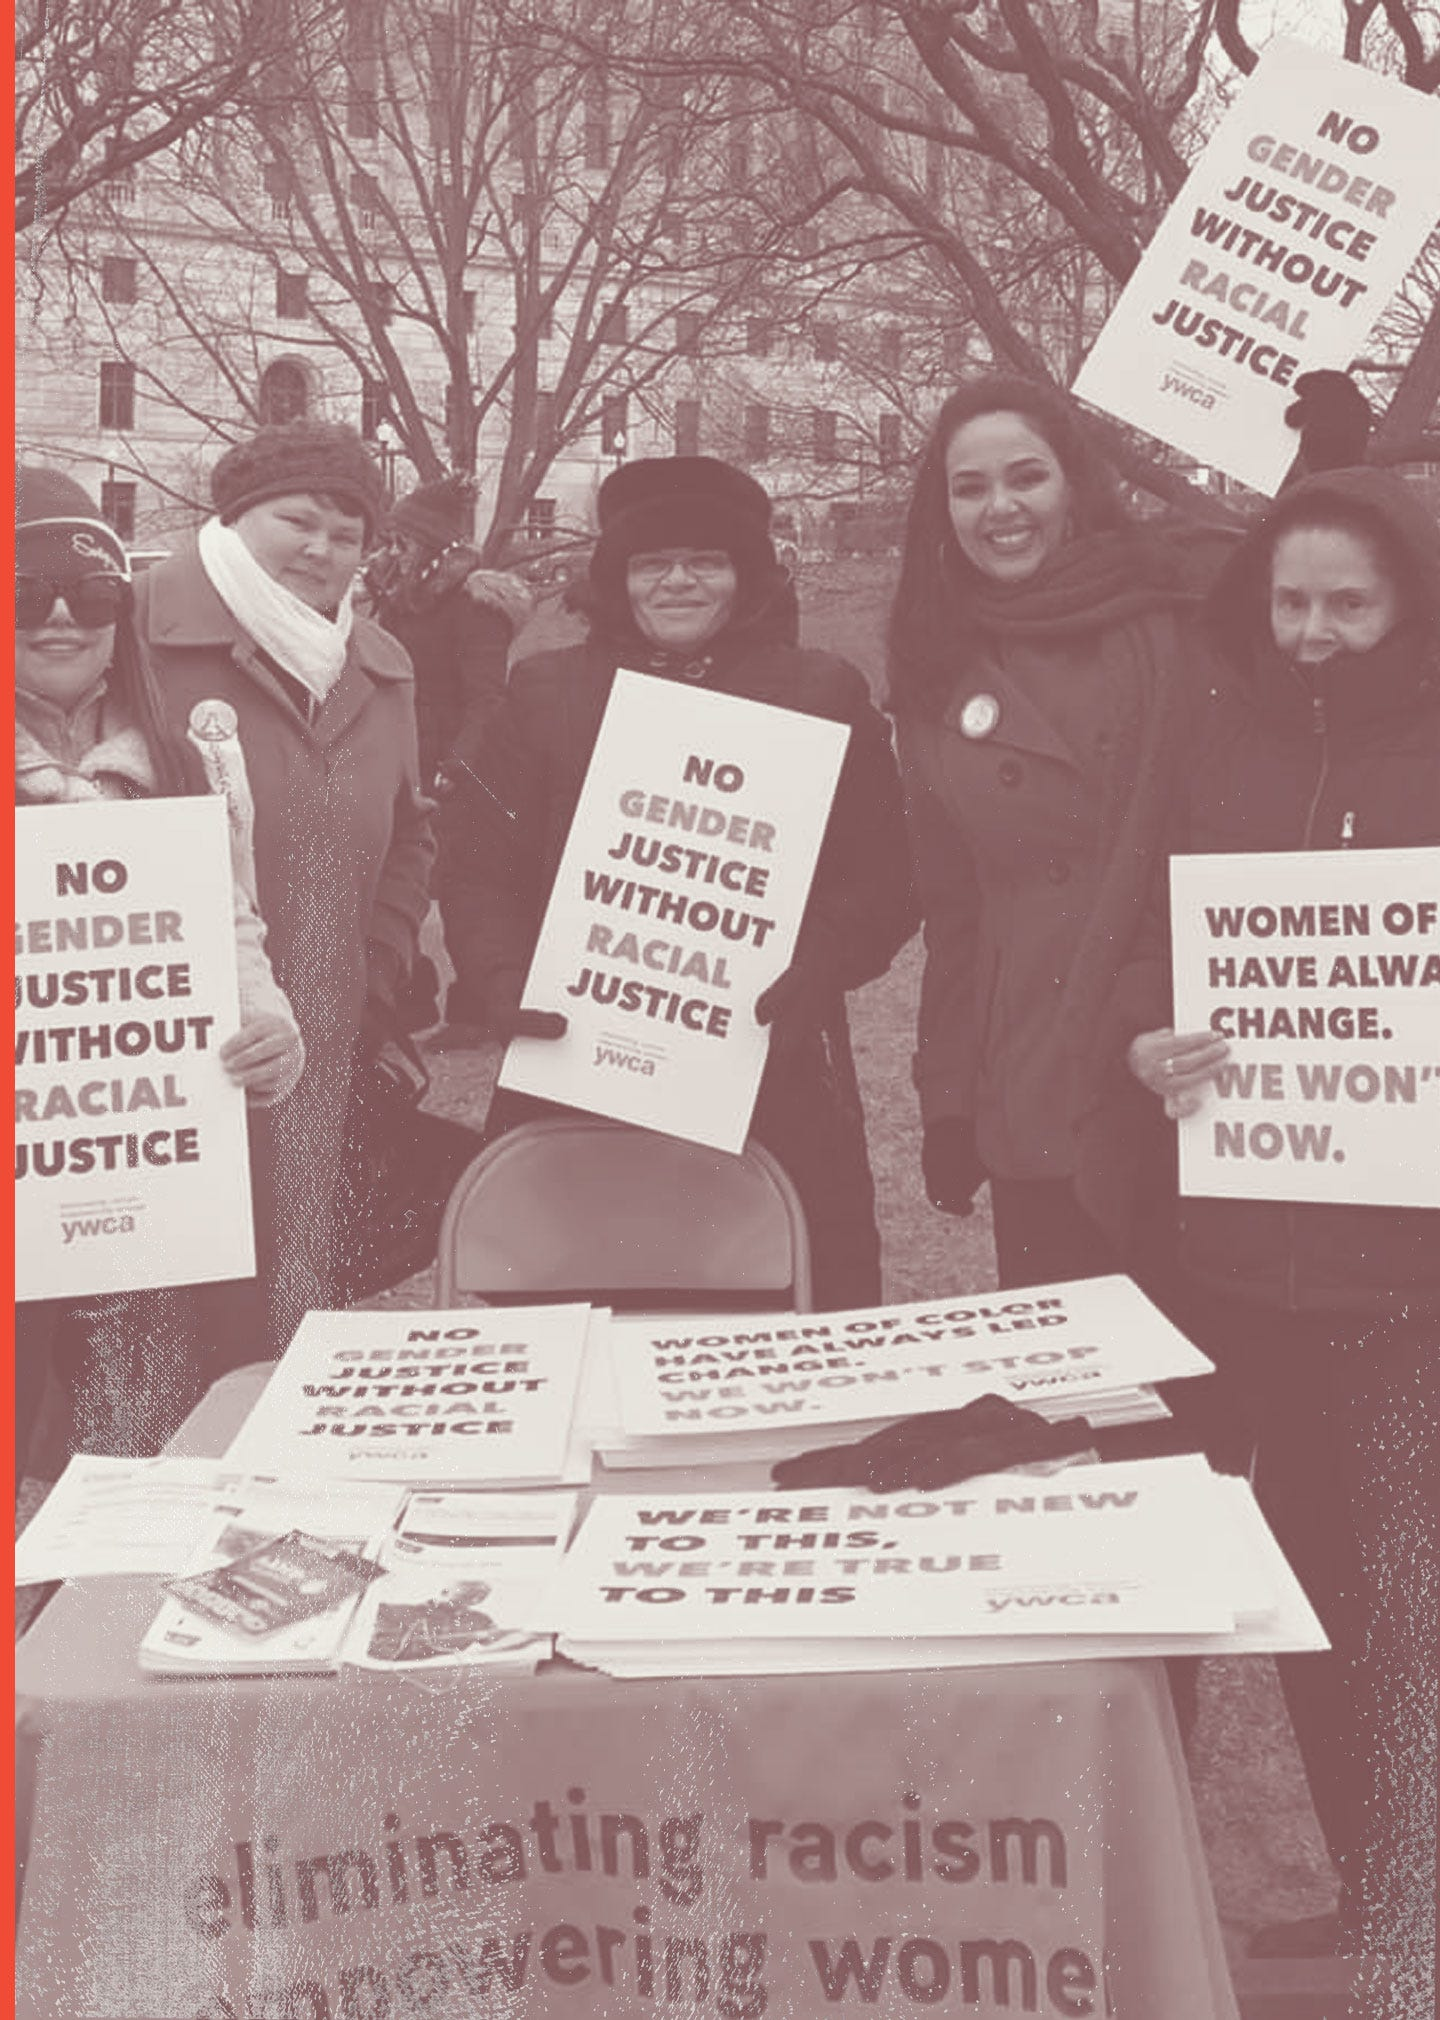 The women of YWCA Rhode Island